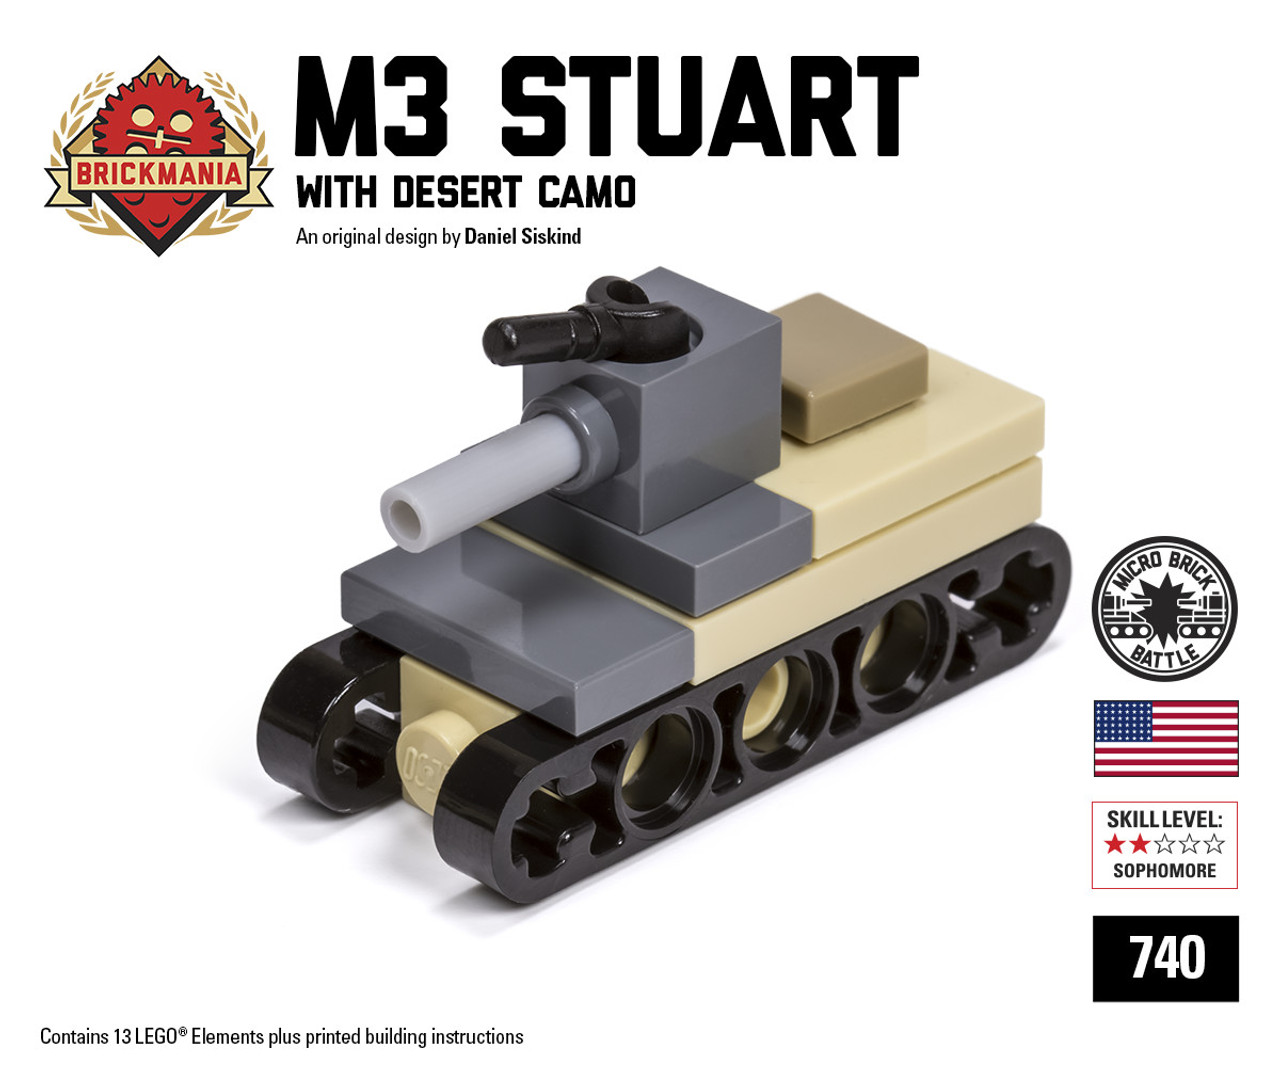 Micro Brick Battle - M3 Stuart